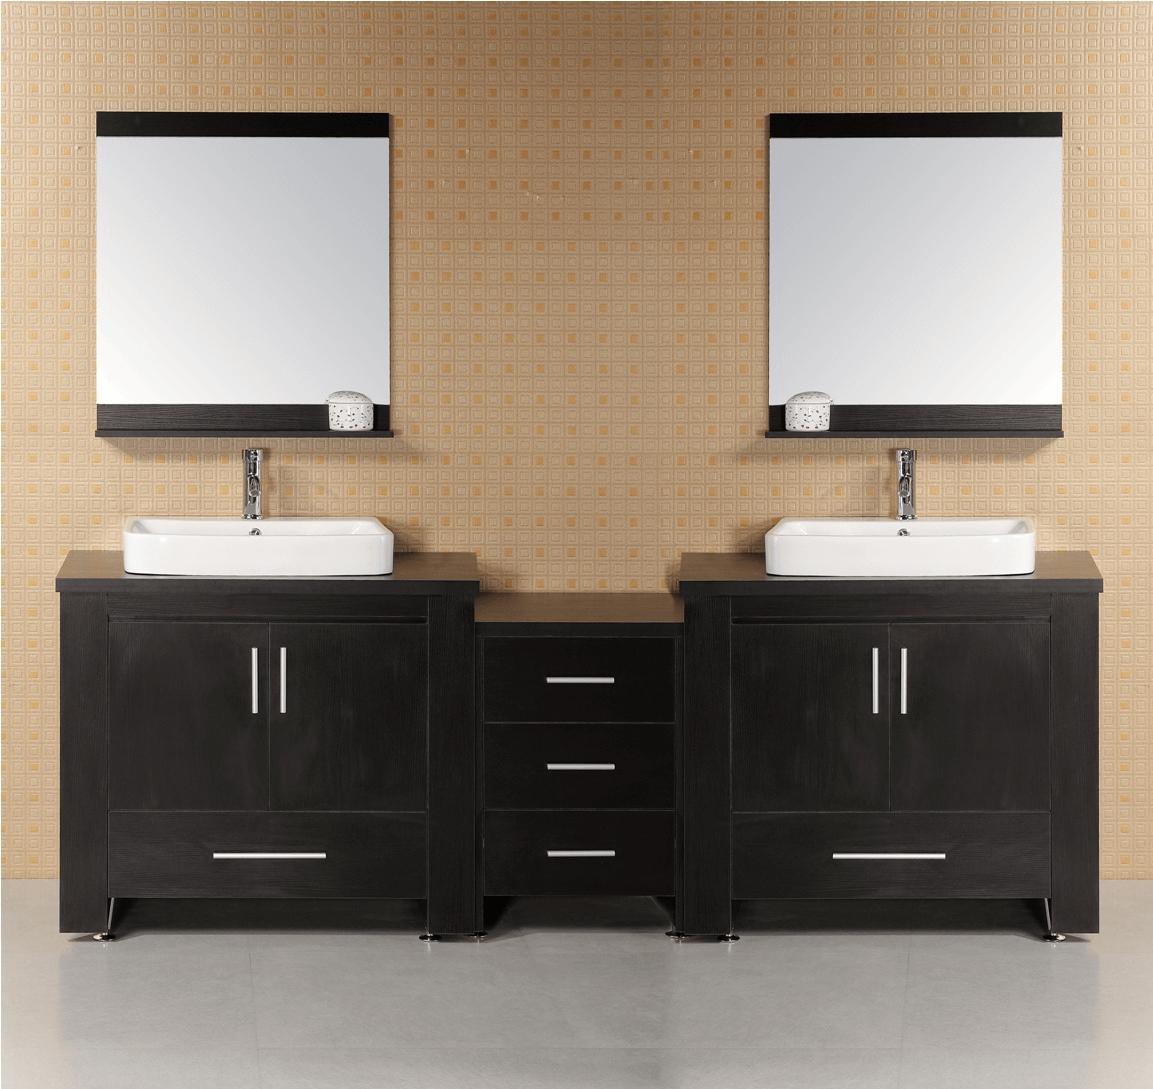 Bathroom vanity cabinet with double sinks